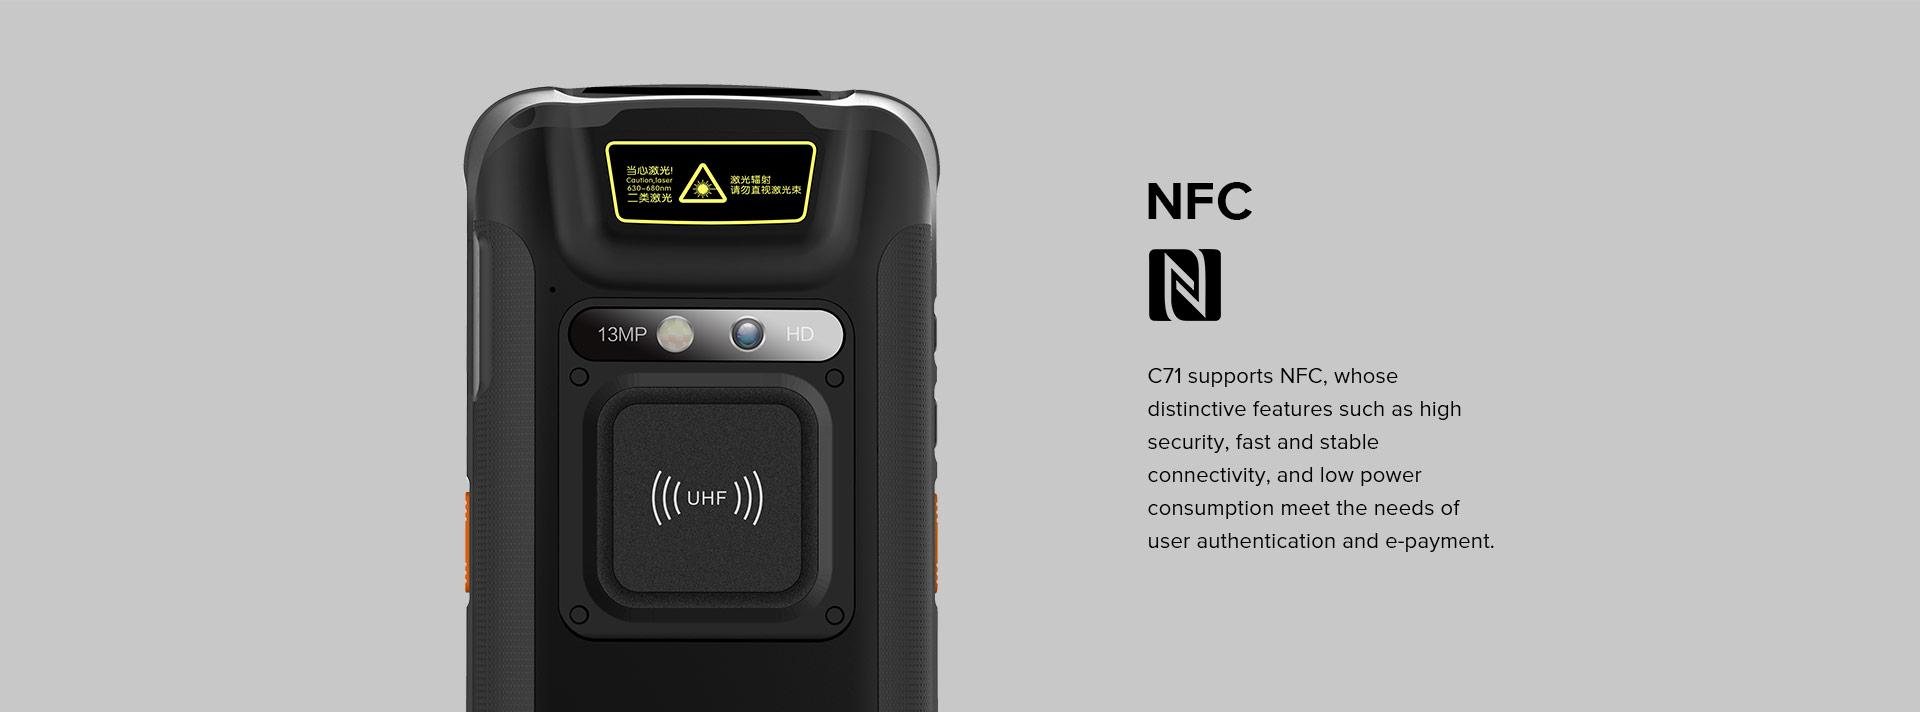 C71 - Android Industrial Mobile Computer RFID UHF - NFC/RFID